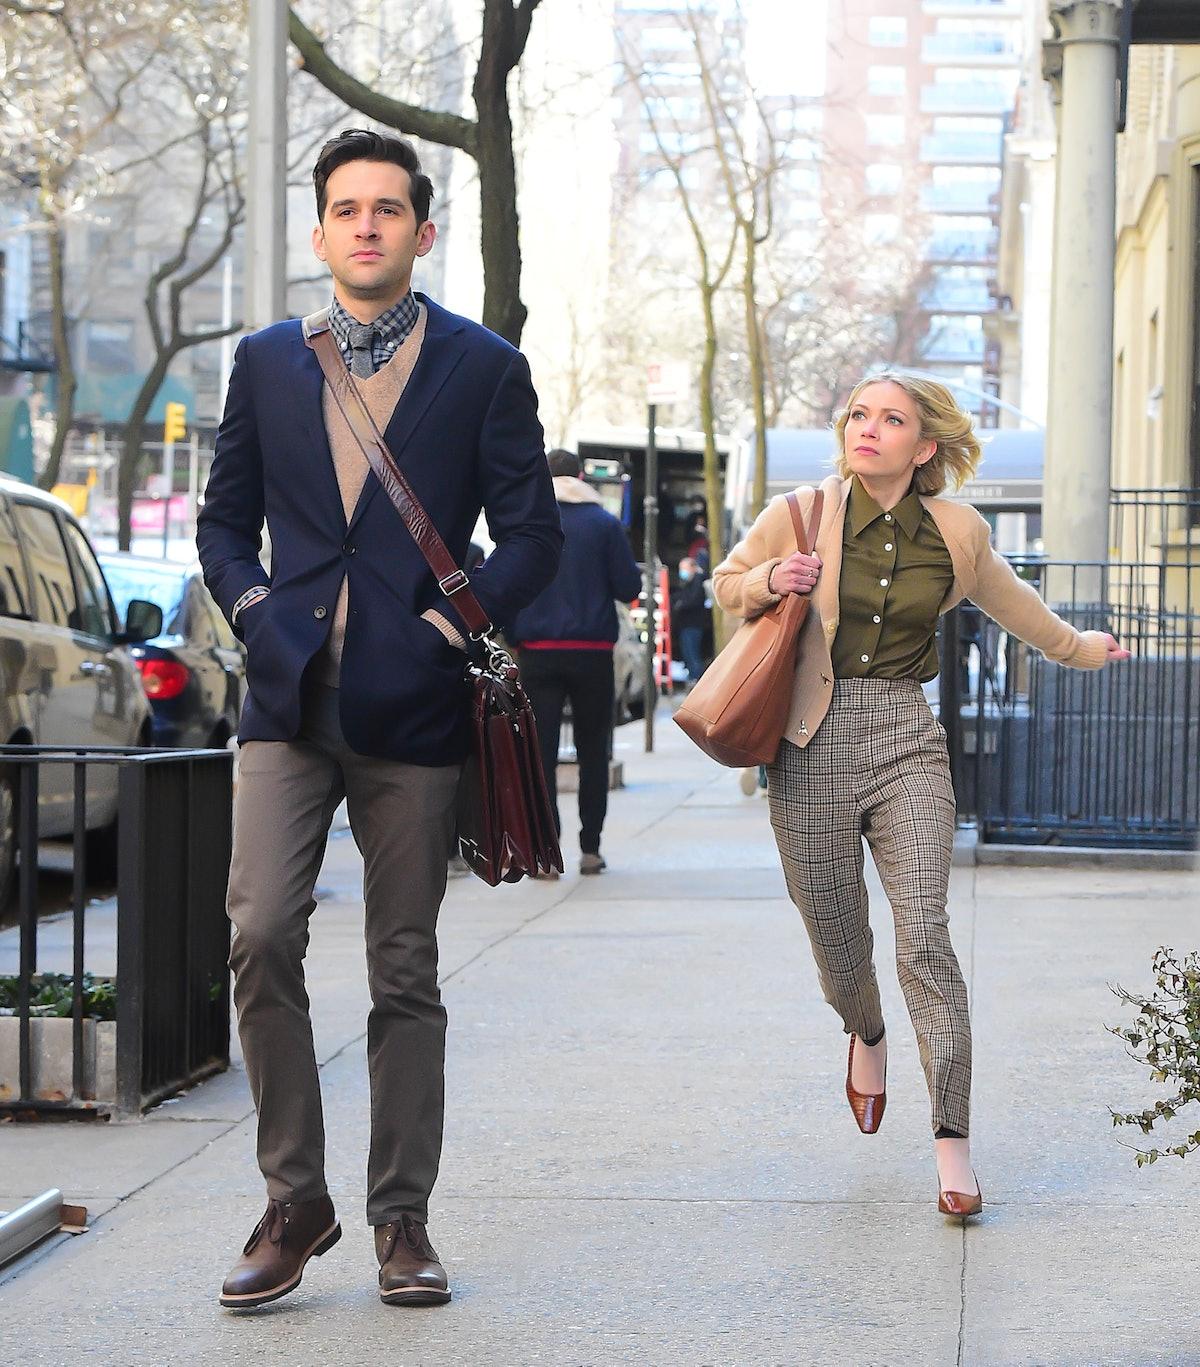 Tavi Gevinson chasing a man on the Gossip Girl set